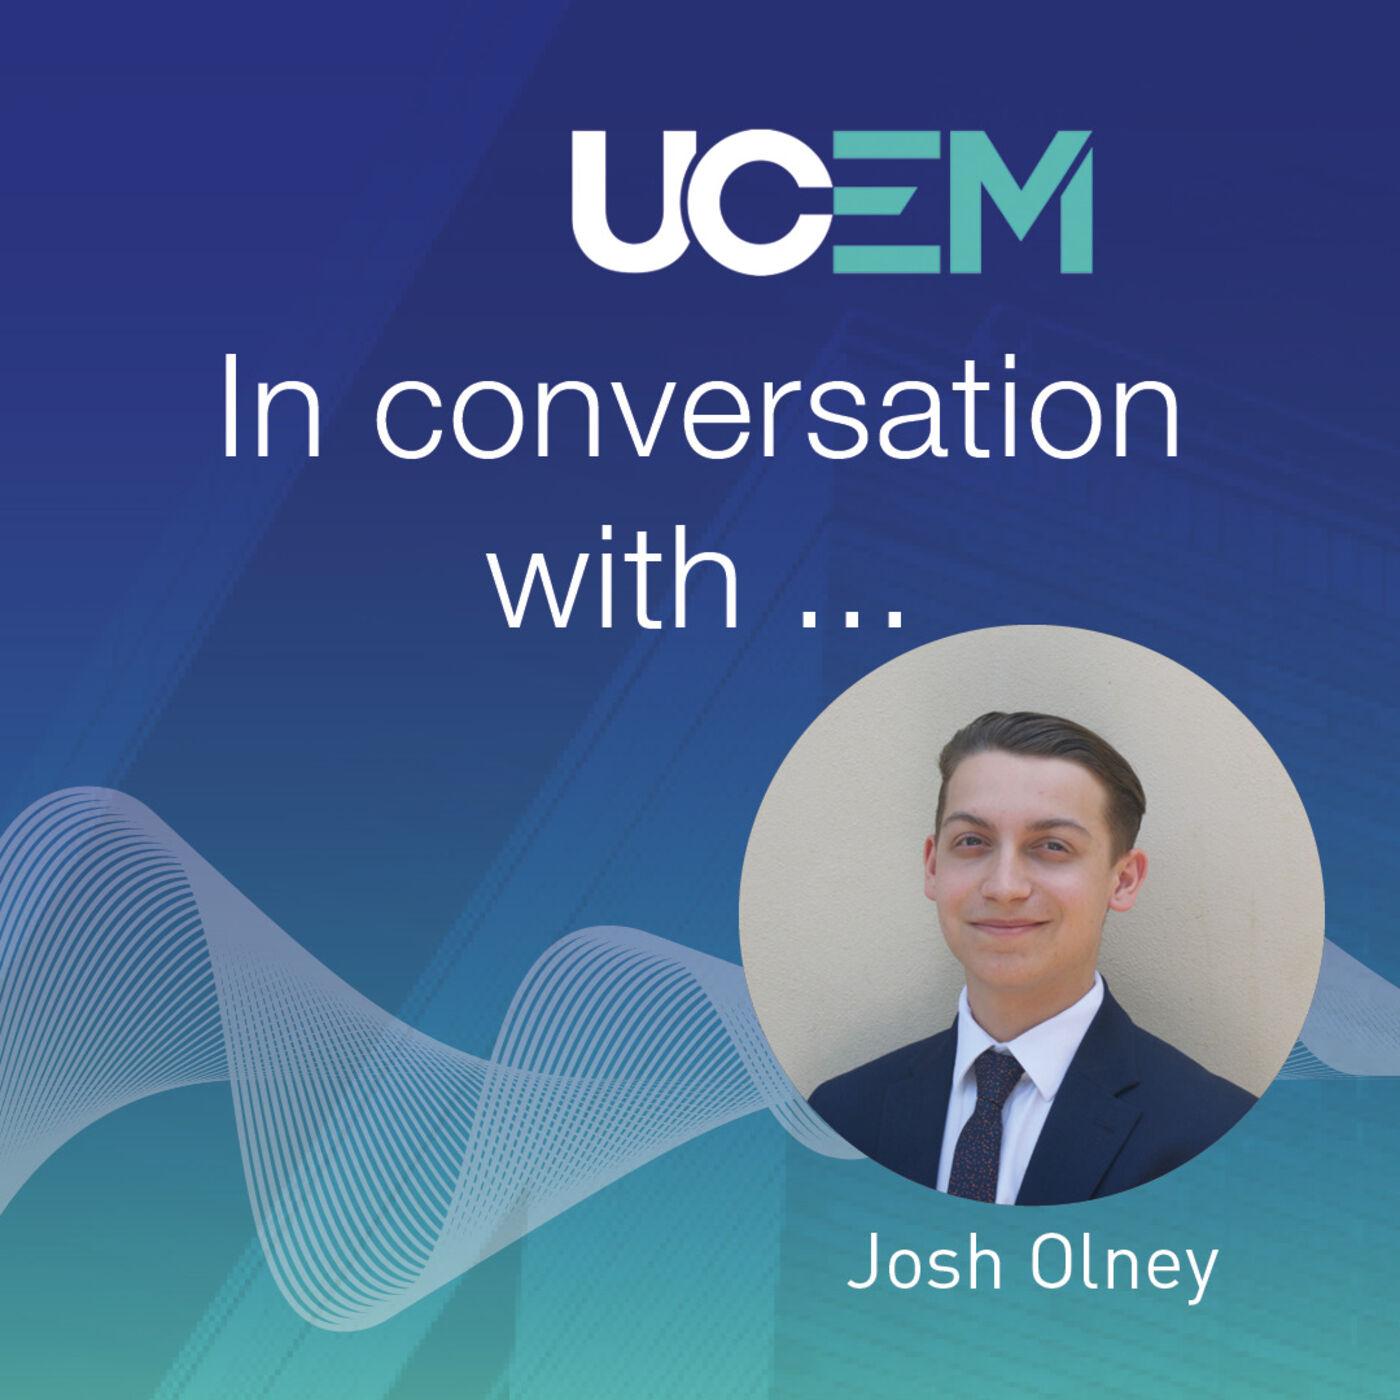 UCEM in conversation with... Josh Olney - Episode 5